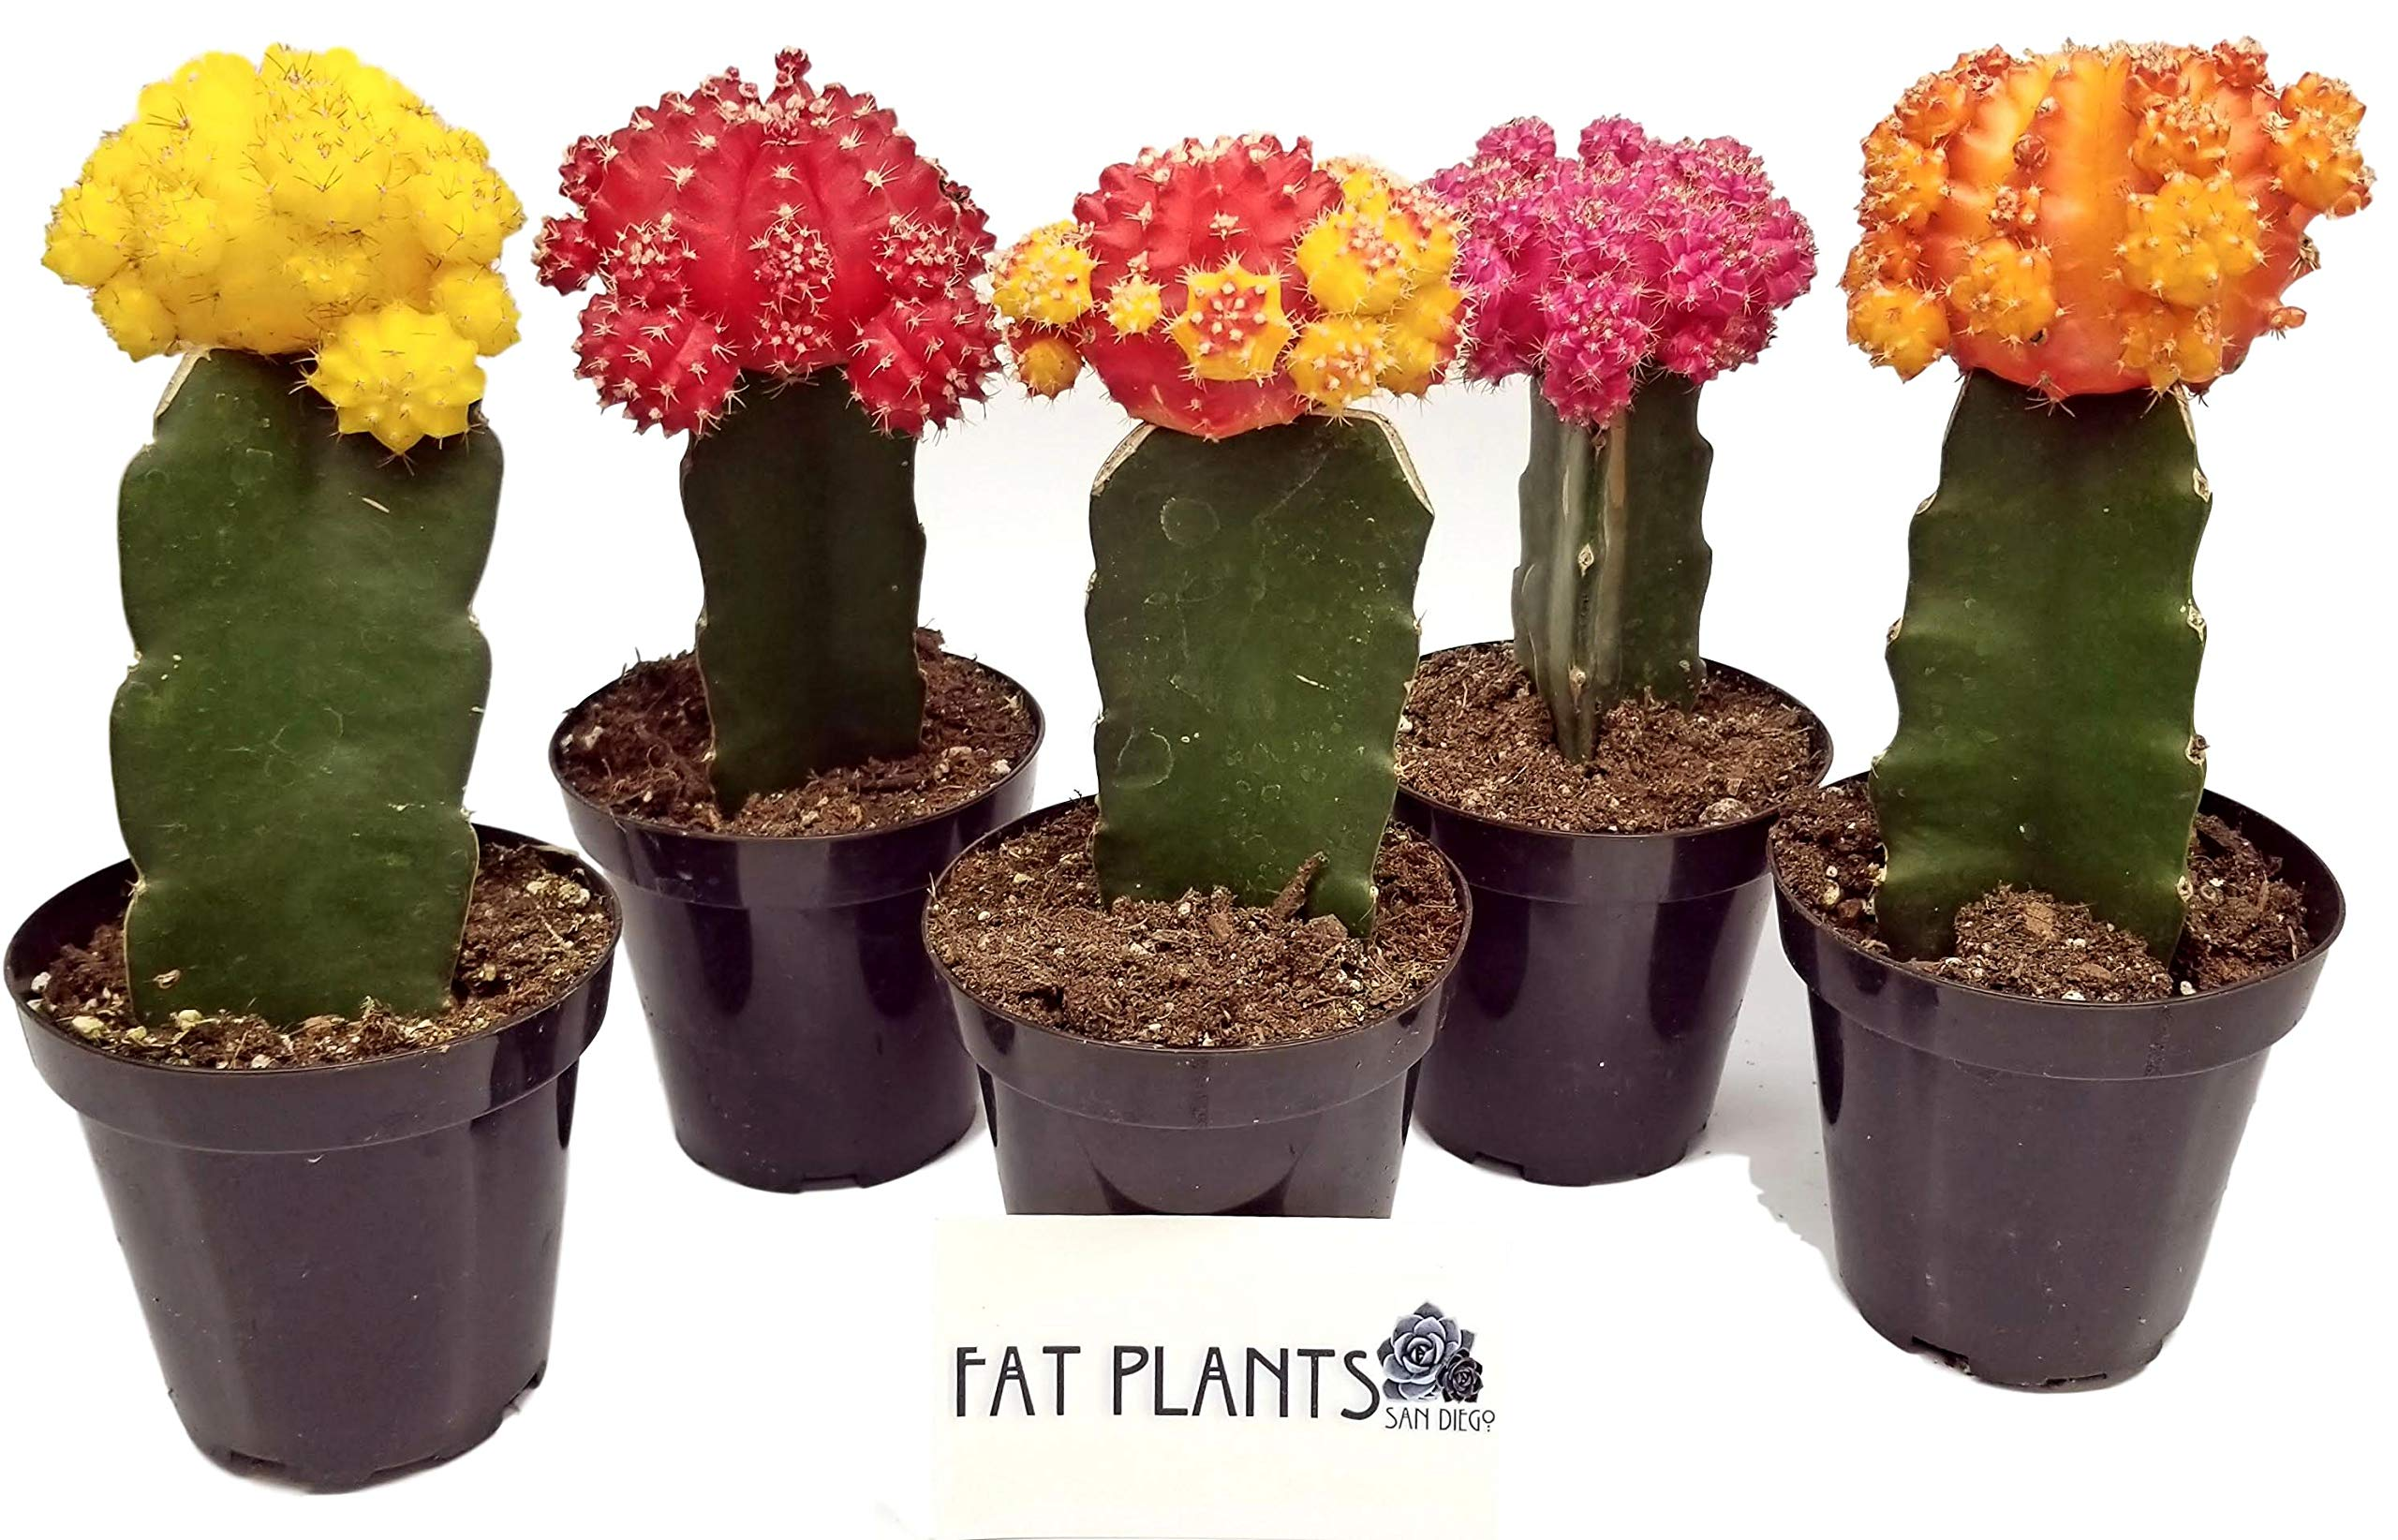 Fat Plants San Diego Large Grafted Moon Cactus Succulent Plants (5, Multi)